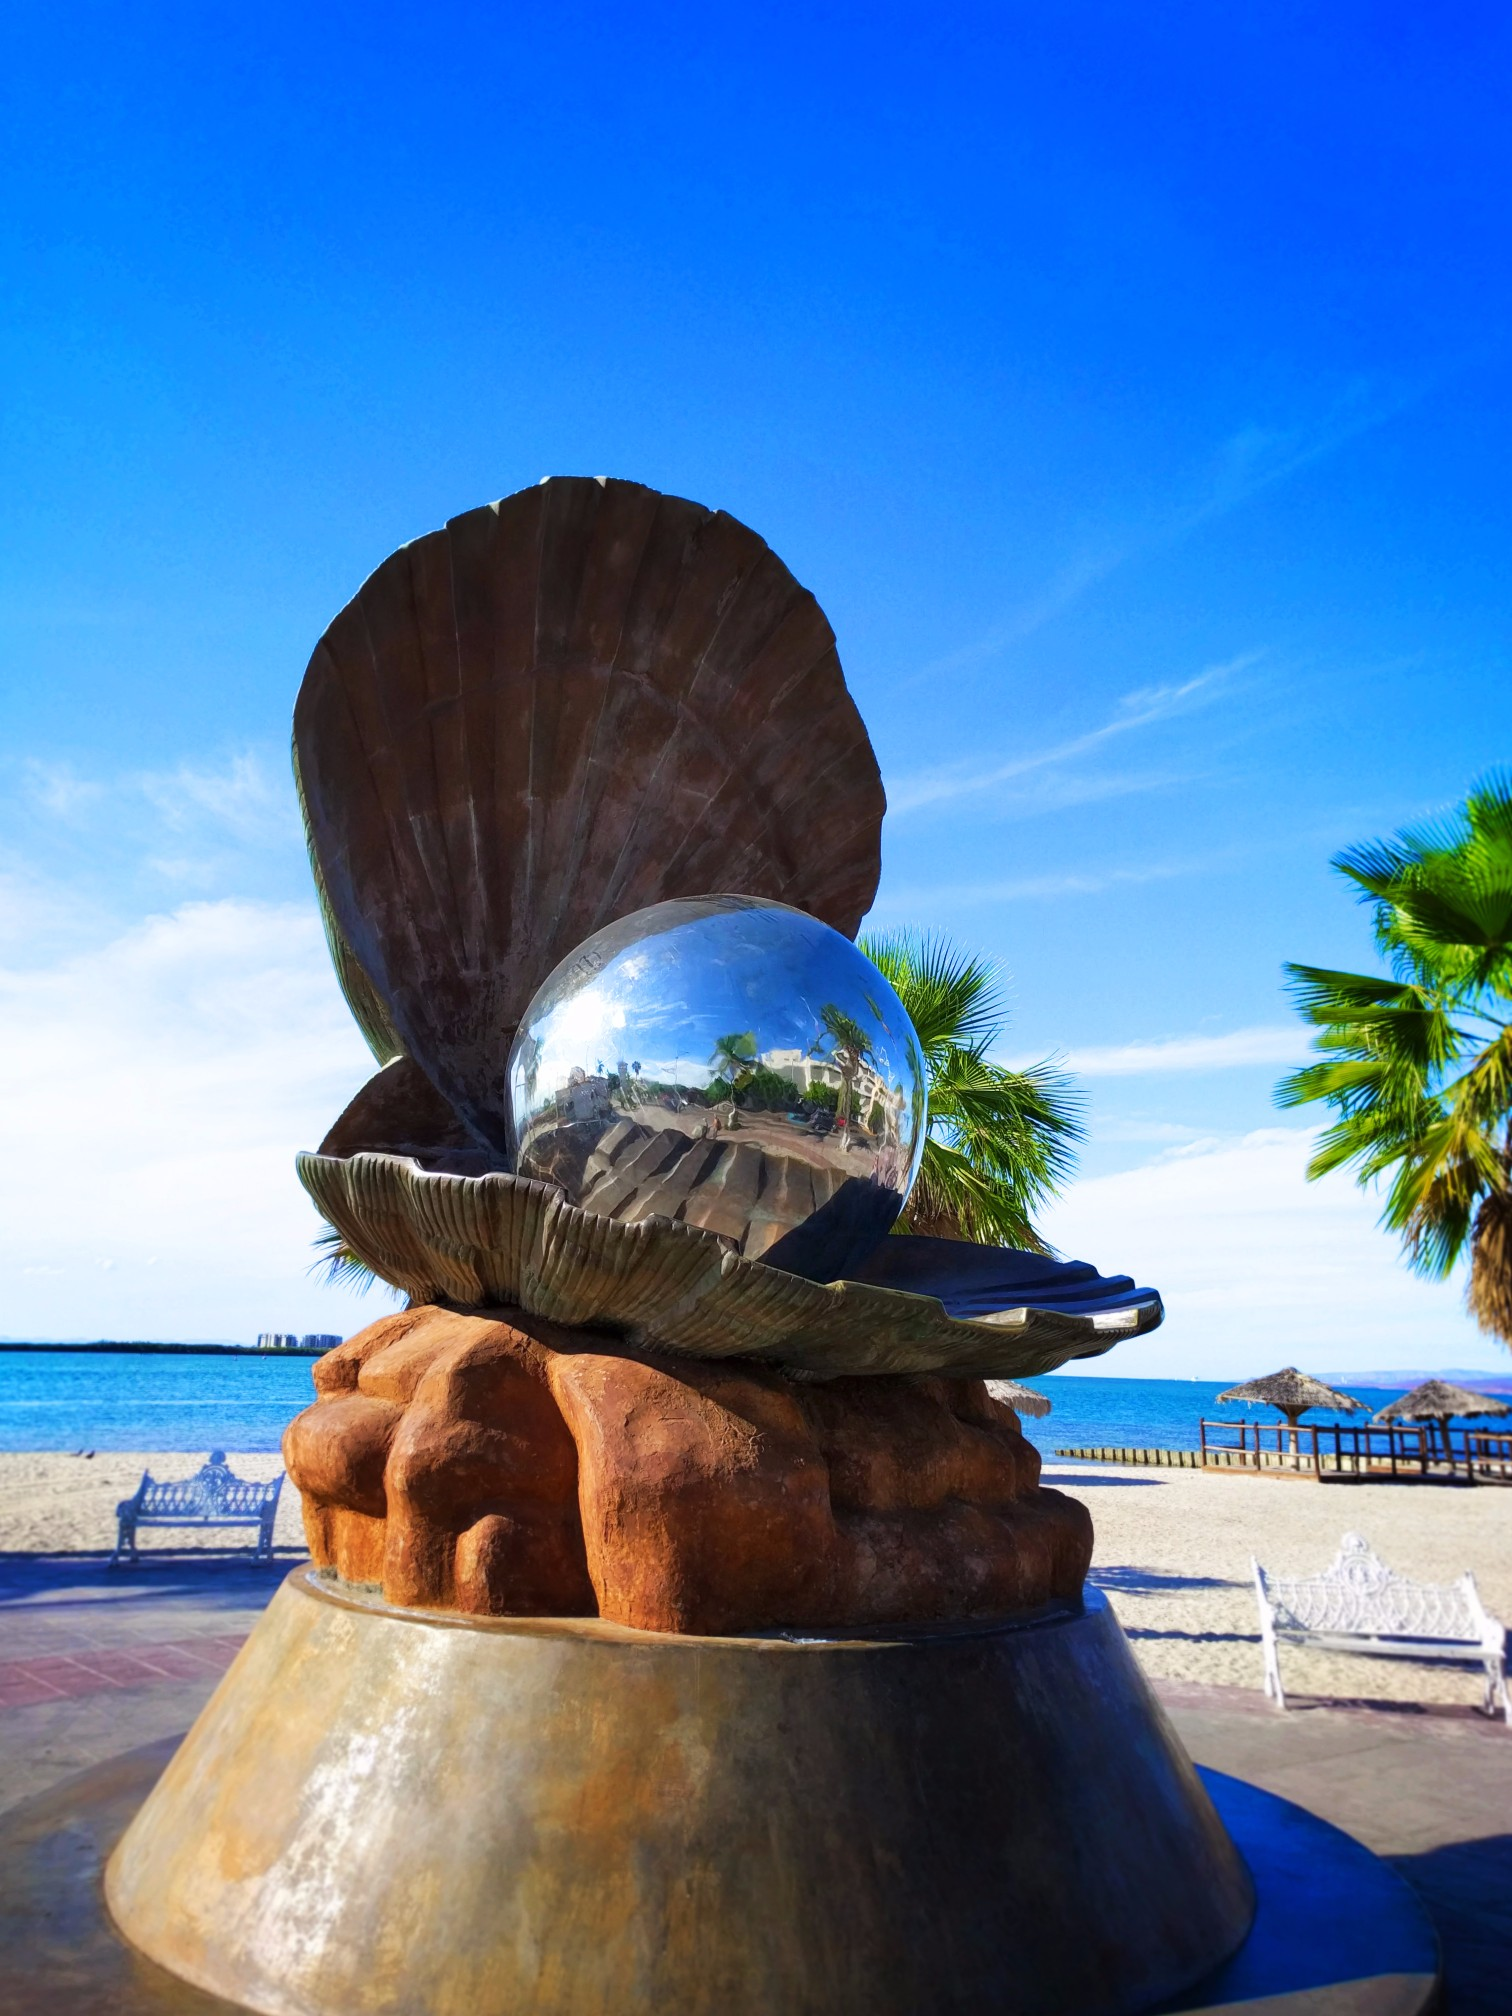 Shiny Pearl Statue La Paz Mexico 2 Travel Dads